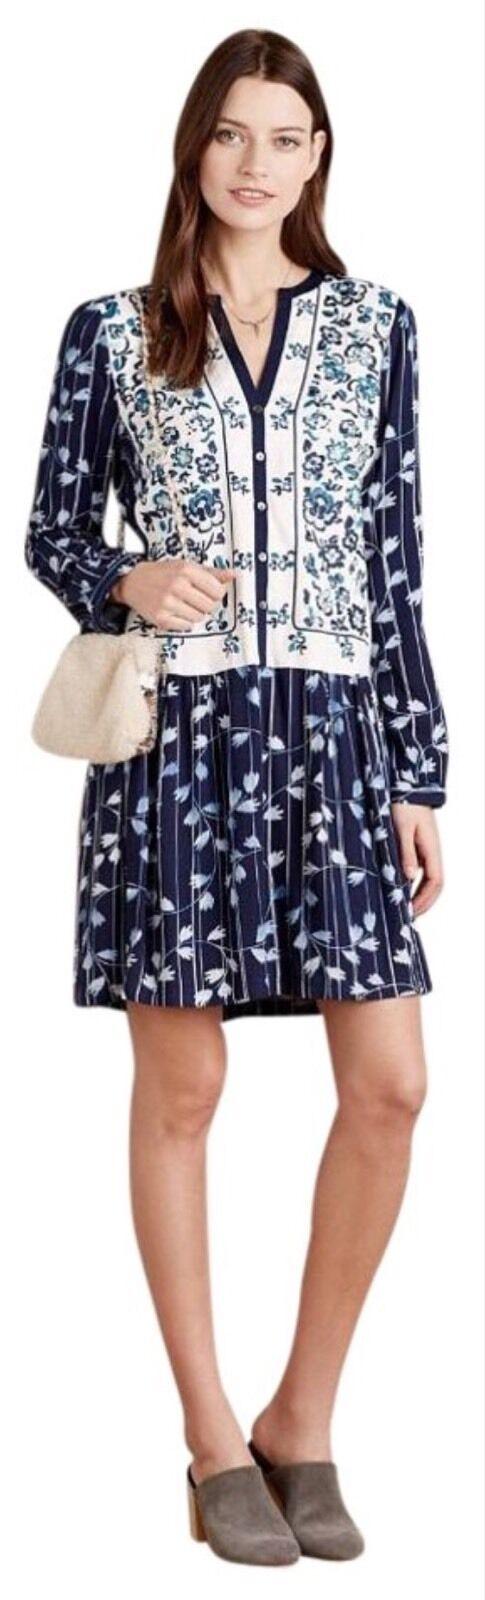 NEW Anthropologie Semele Floral Shirt Dress Größe Medium Petite